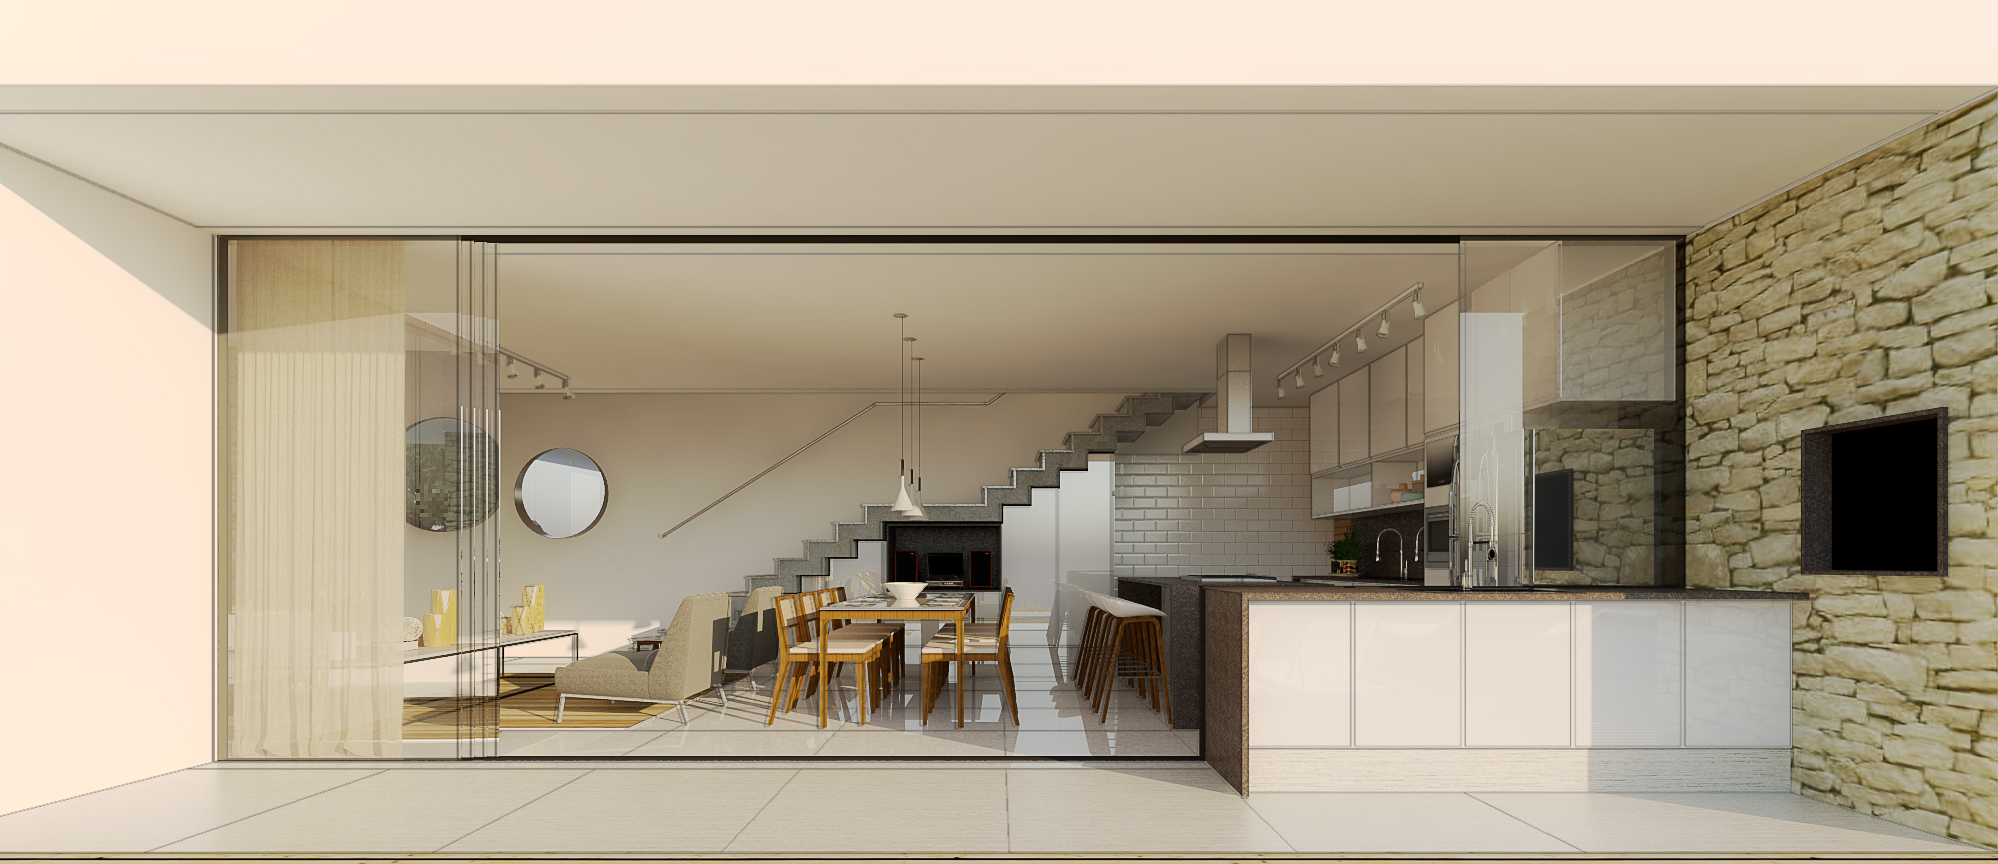 residencia-dm-daniel-carvalho-arquiteto-brumadinho-casa-branca-4.jpg